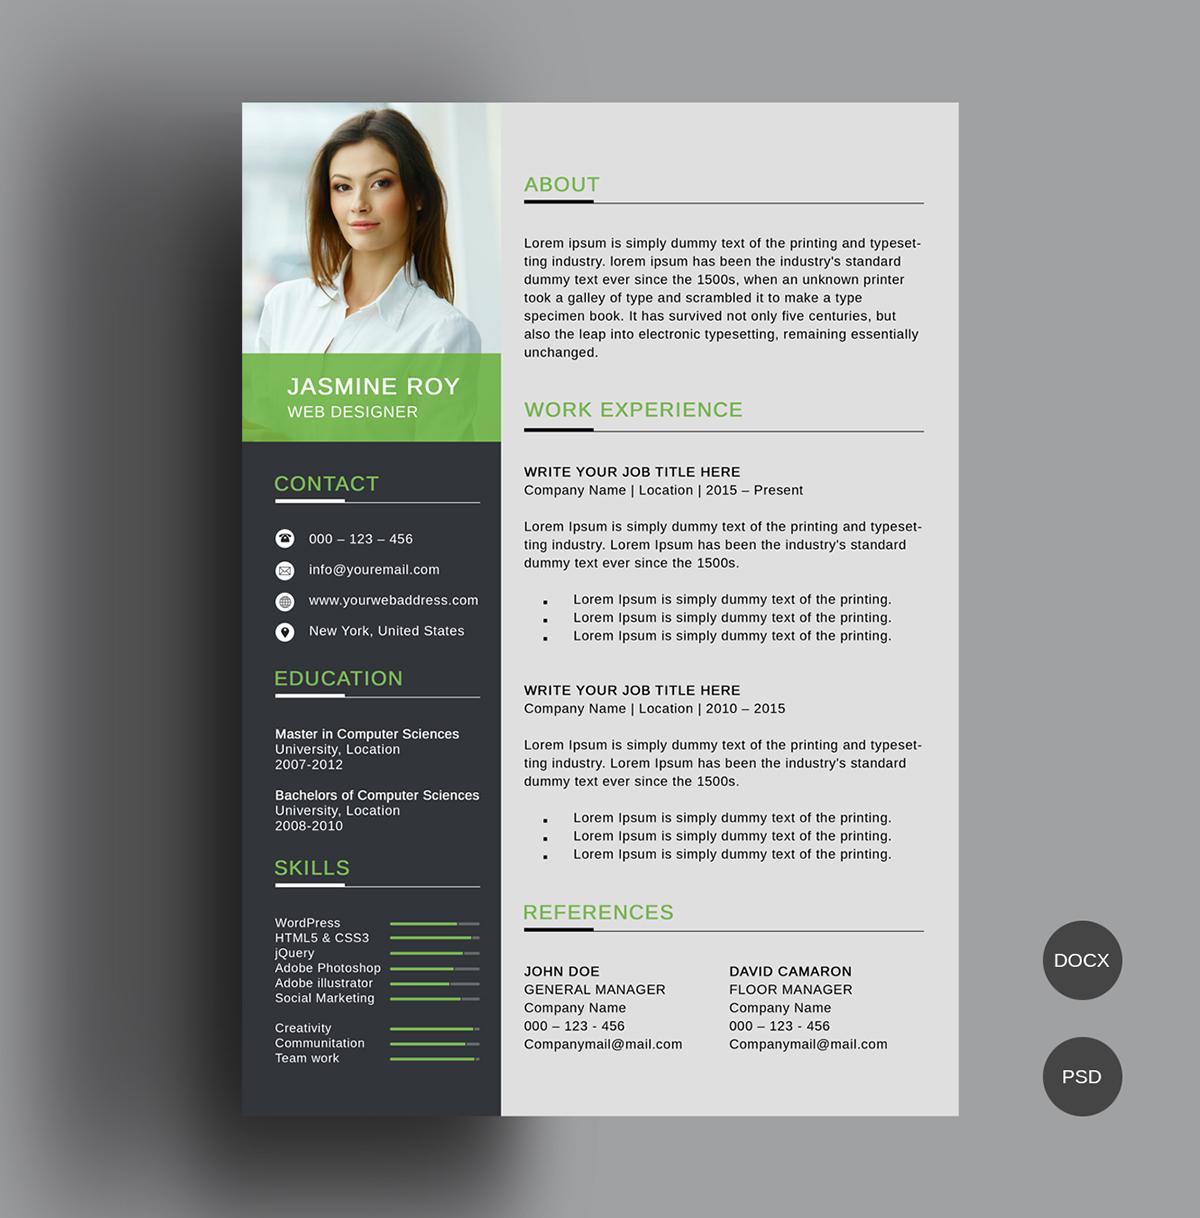 Resume Template Free C7a89962124065 5a859e79780dd resume template free|wikiresume.com